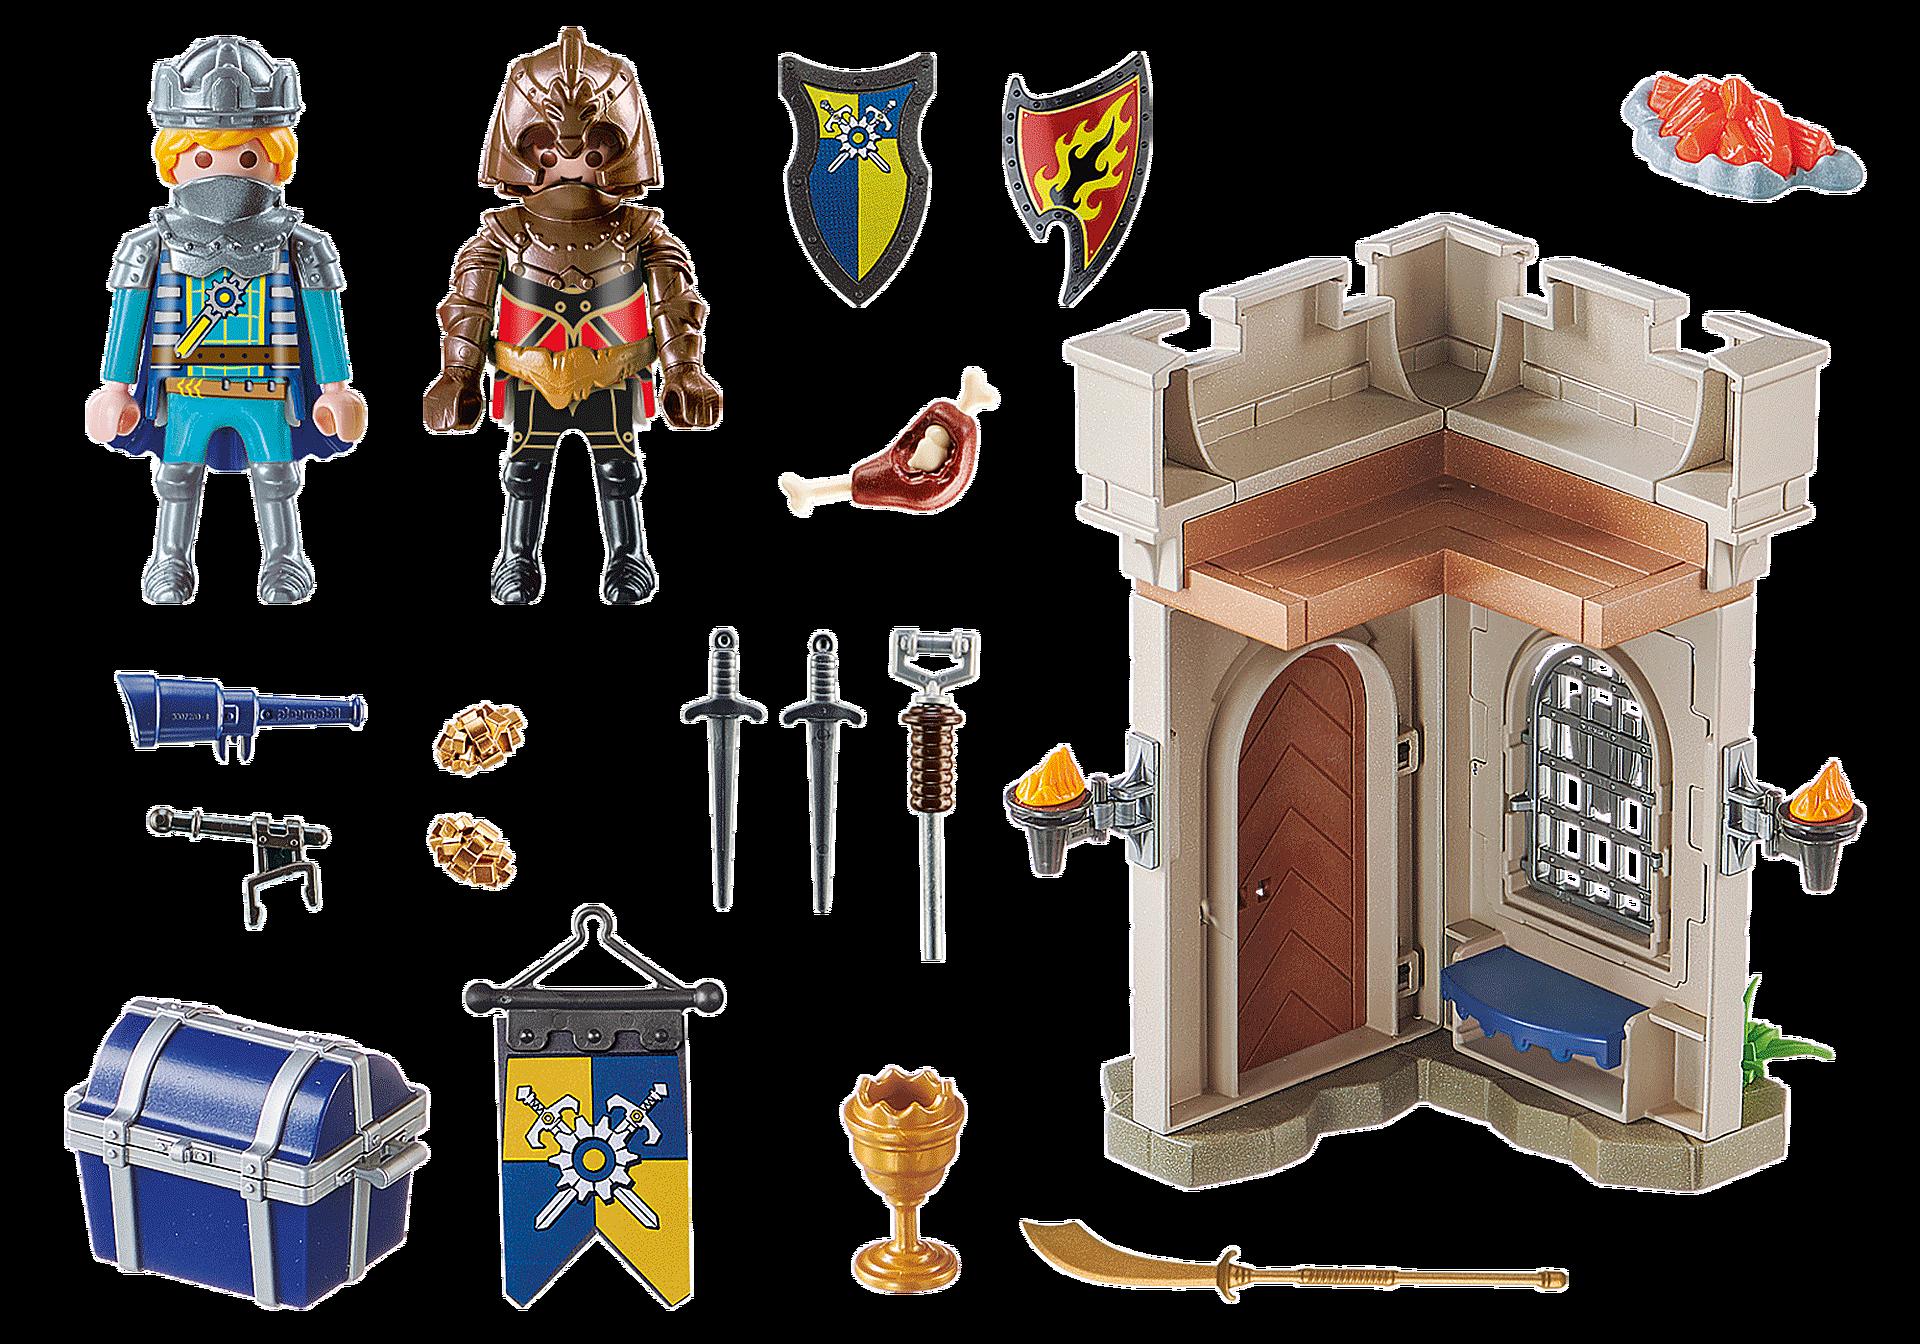 70499 Starter Pack Novelmore Knights' Fortress zoom image3